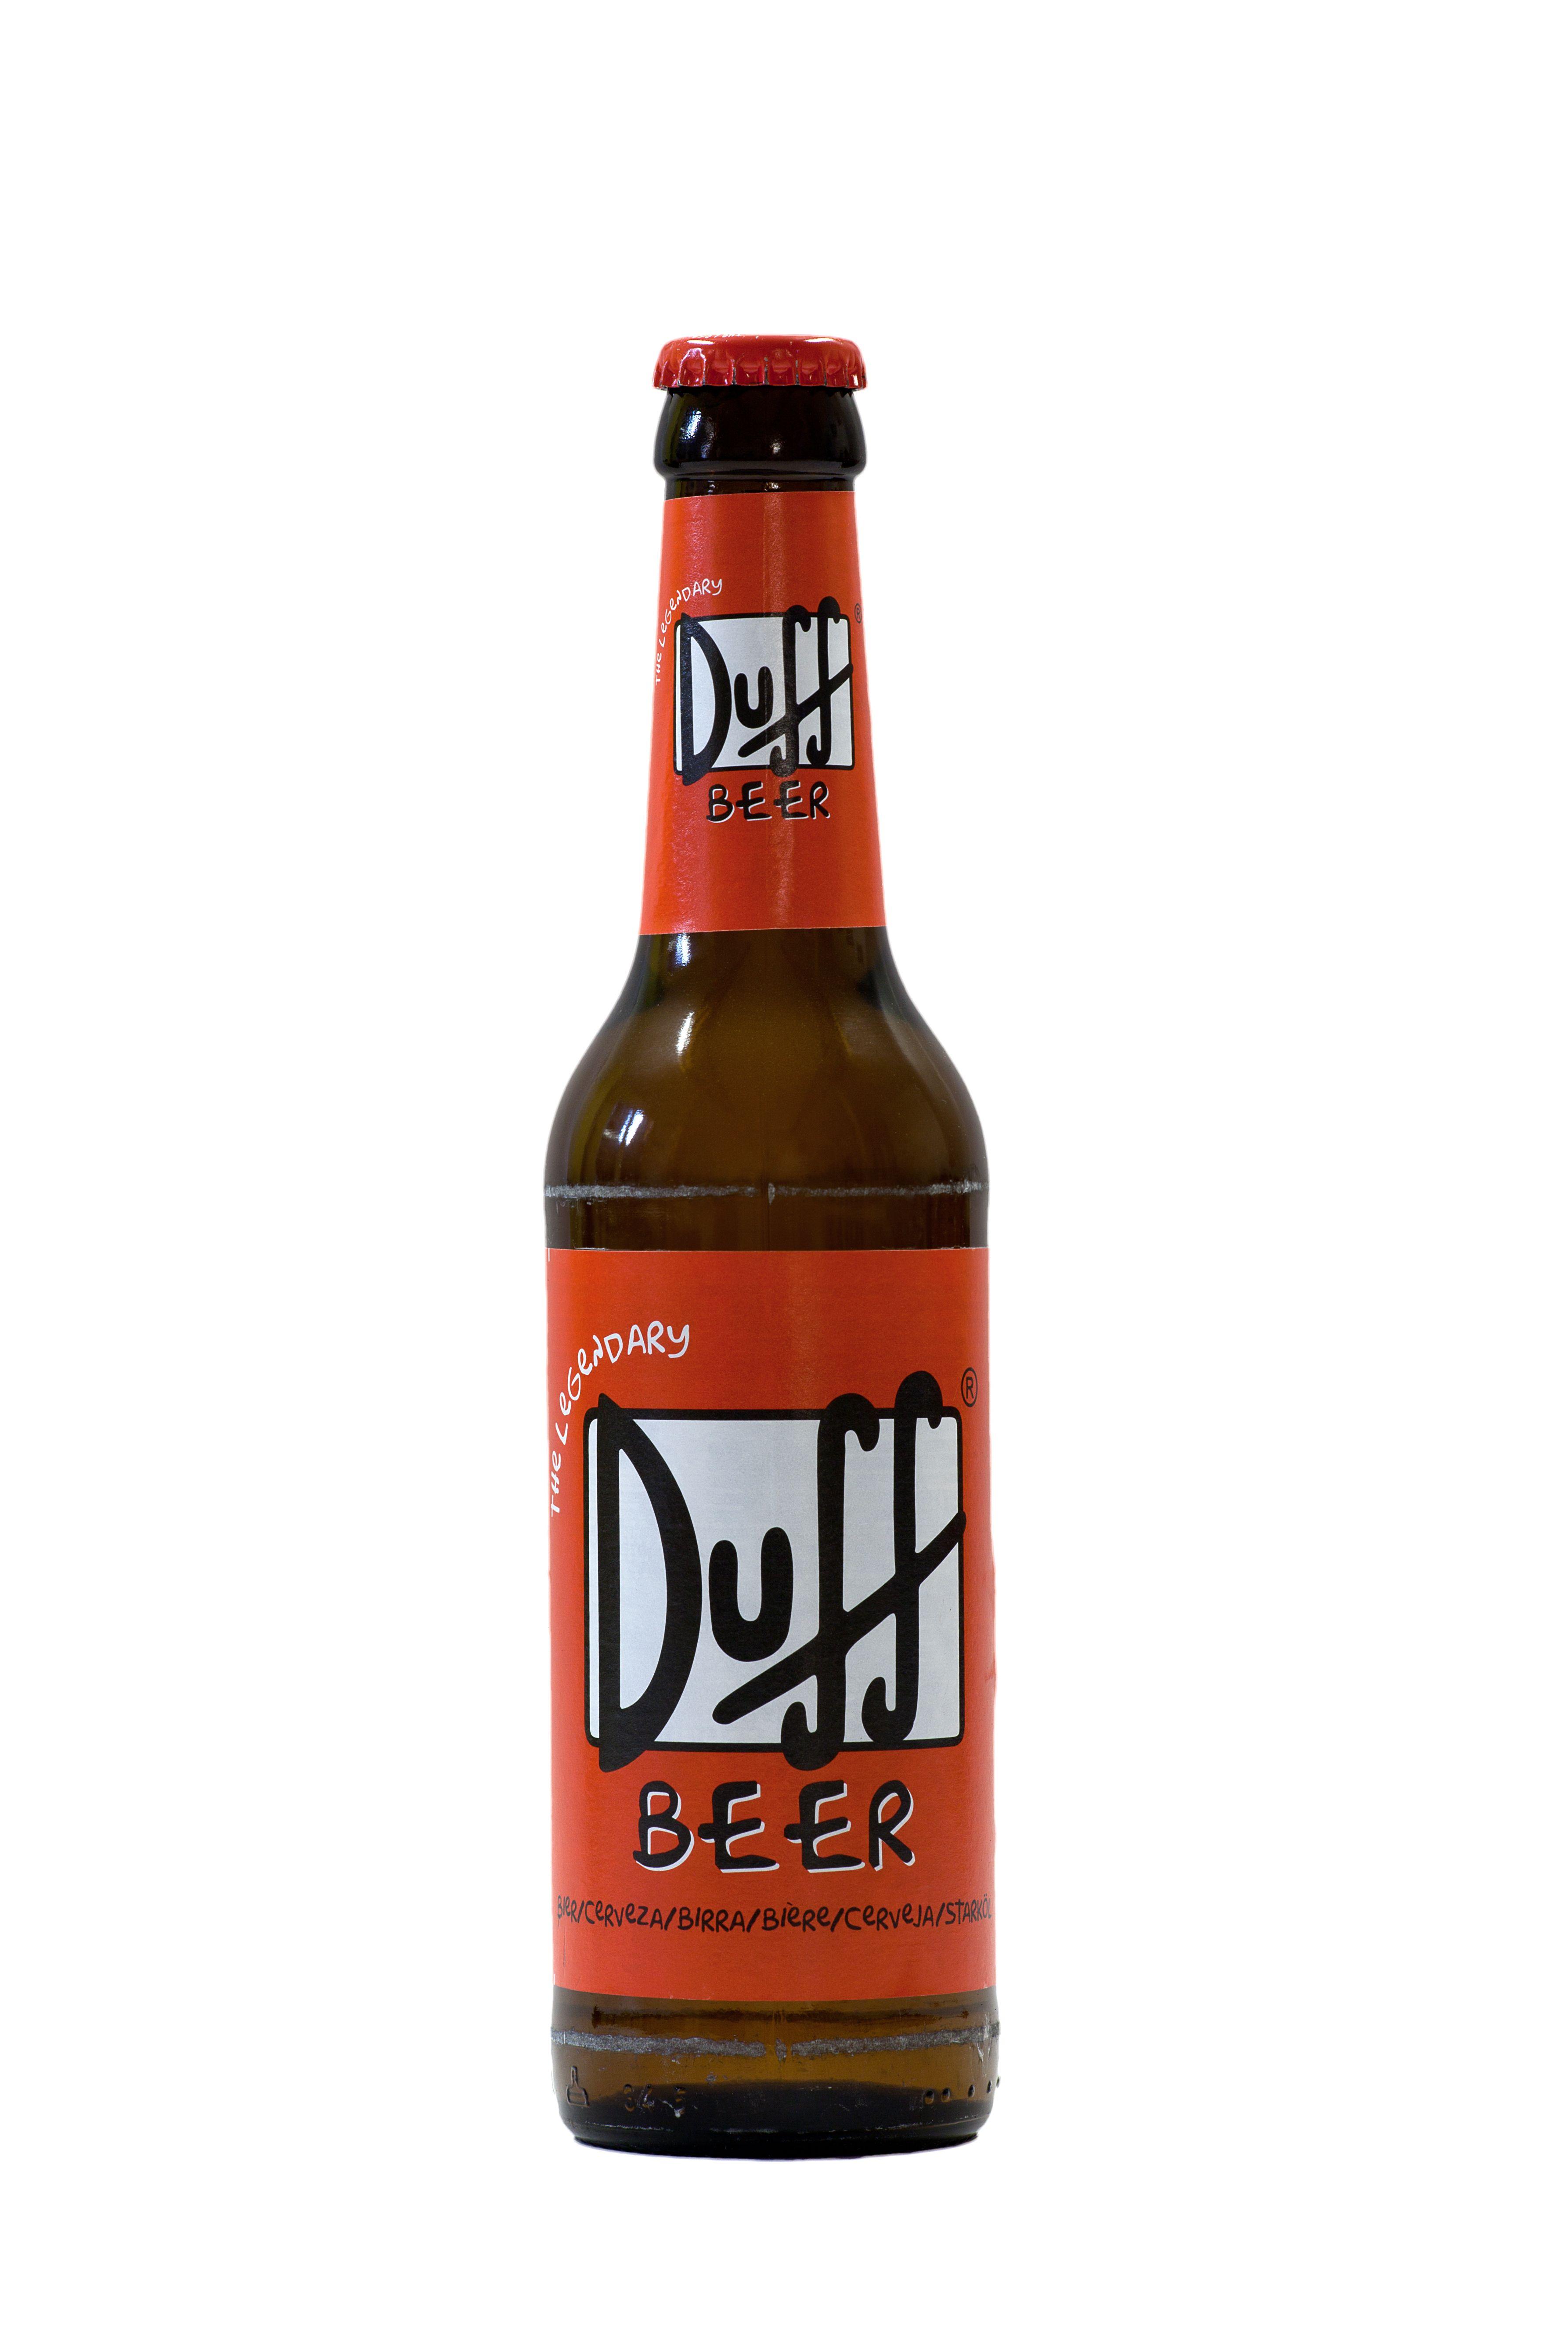 Duff Beer For Me Duff Beer Beer Beer Bottle